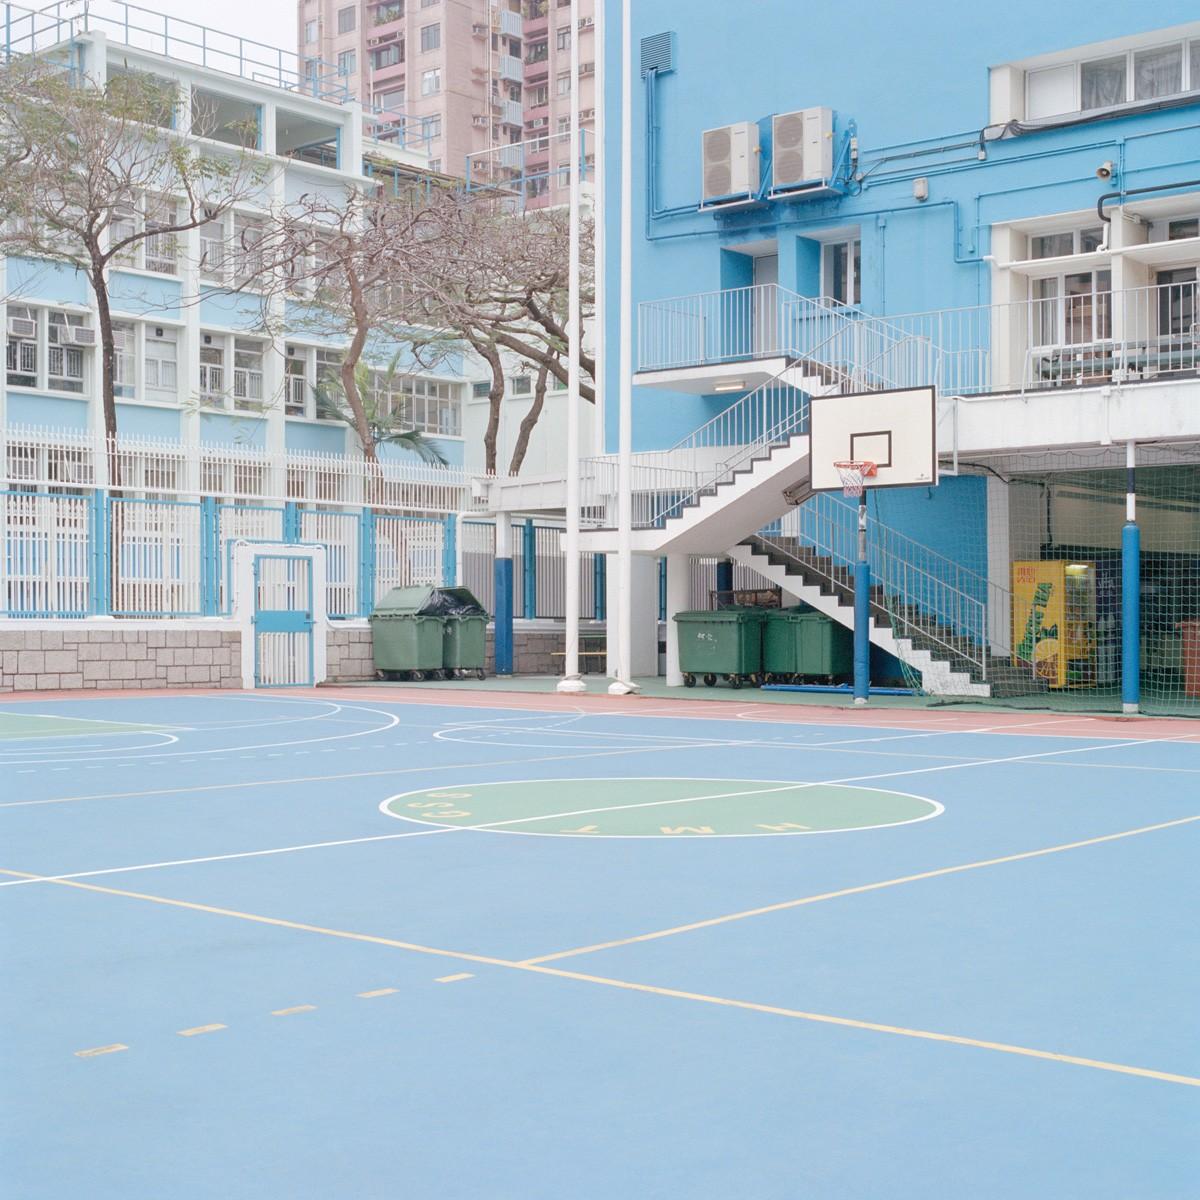 ward-roberts-courts-02.6-95792c0e769bcbcd05a1d7781289612c.jpg